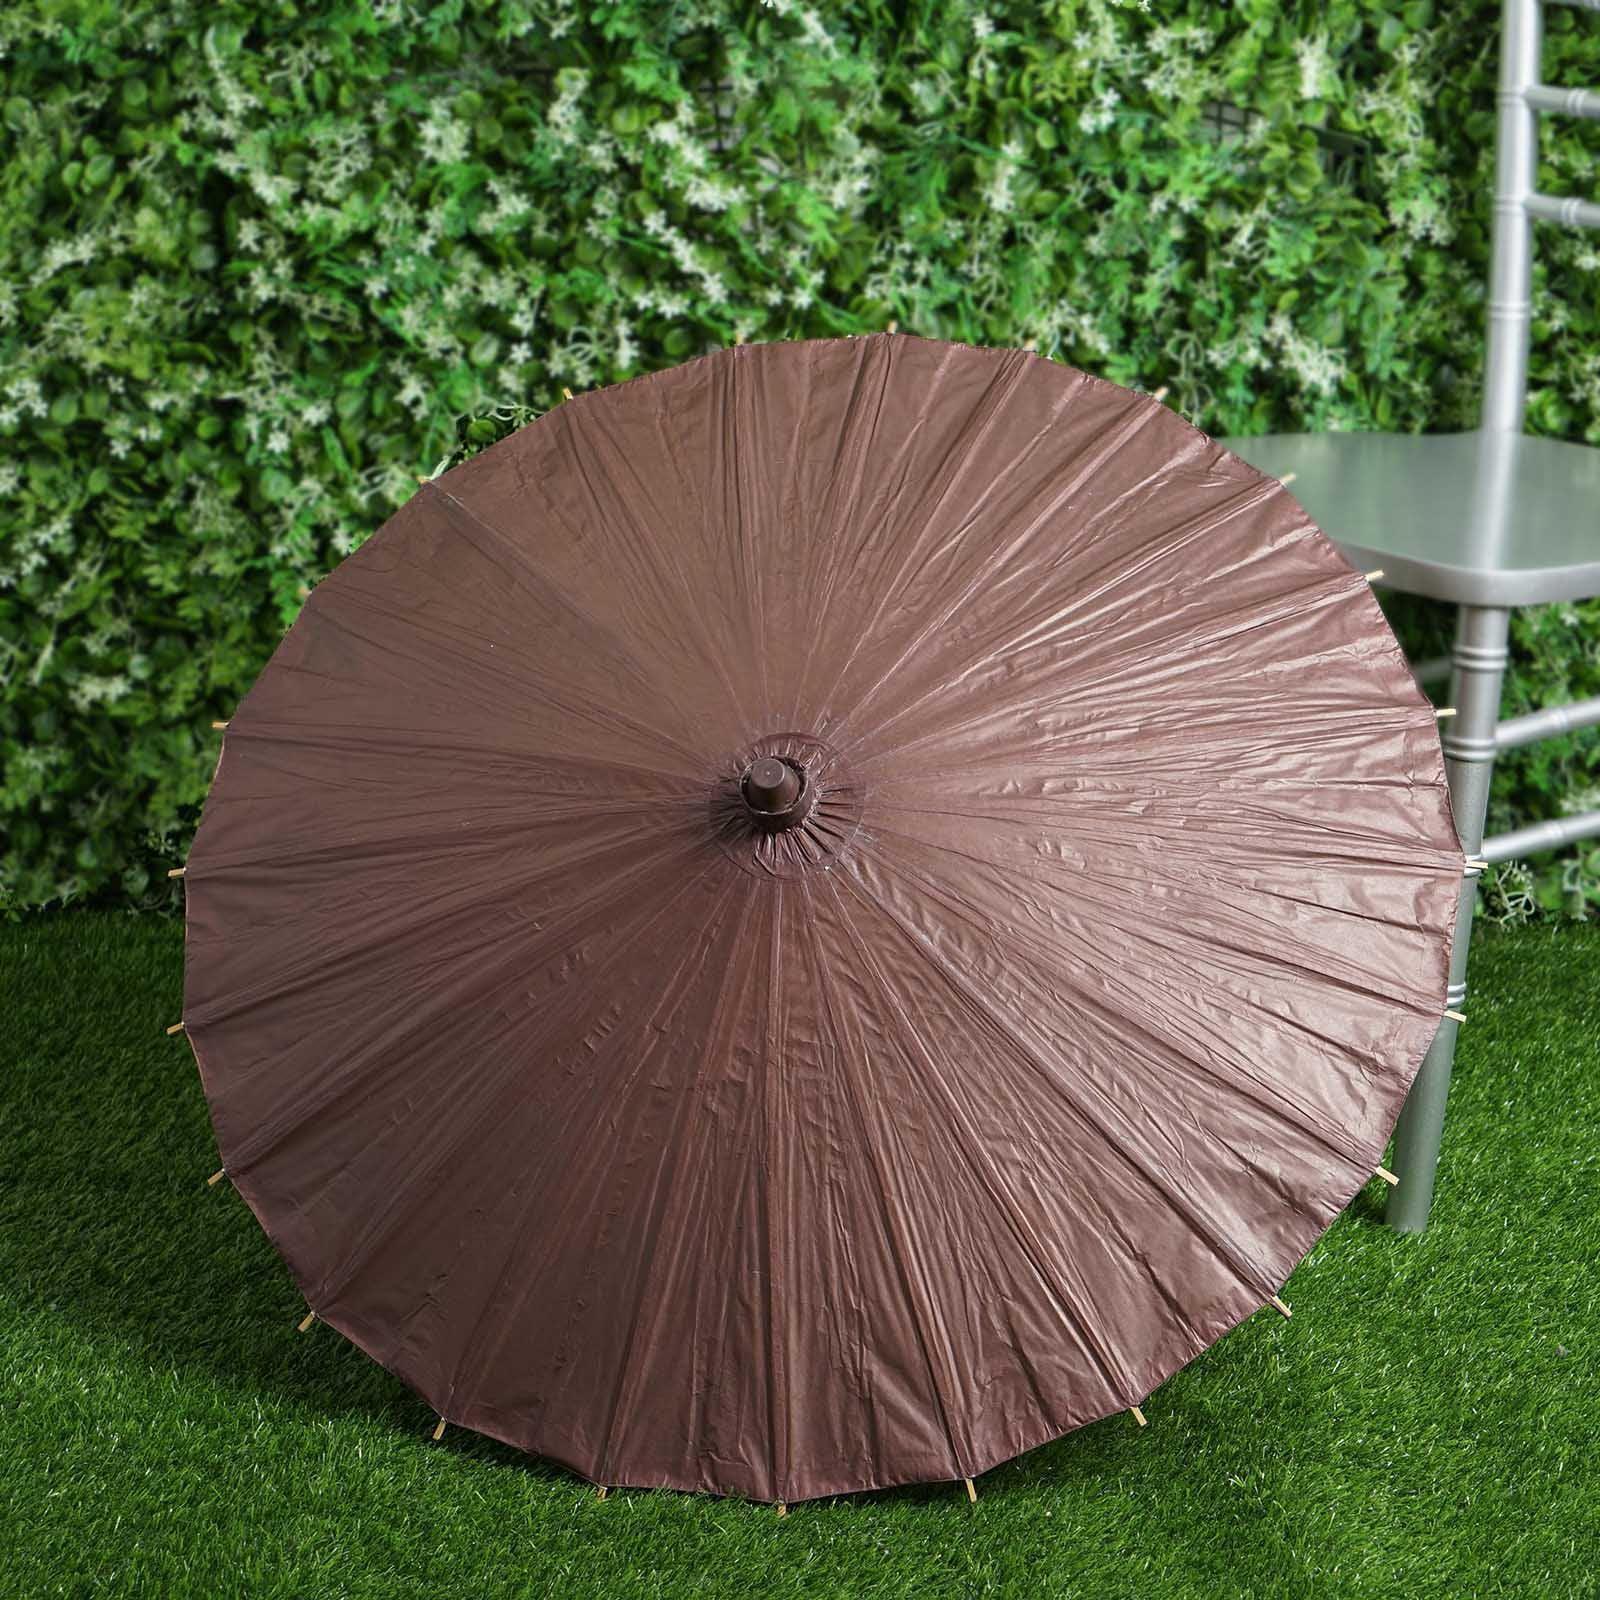 BalsaCircle Paper Parasol Umbrellas - Wedding Party Favors Centerpieces Decorations Cheap Supplies